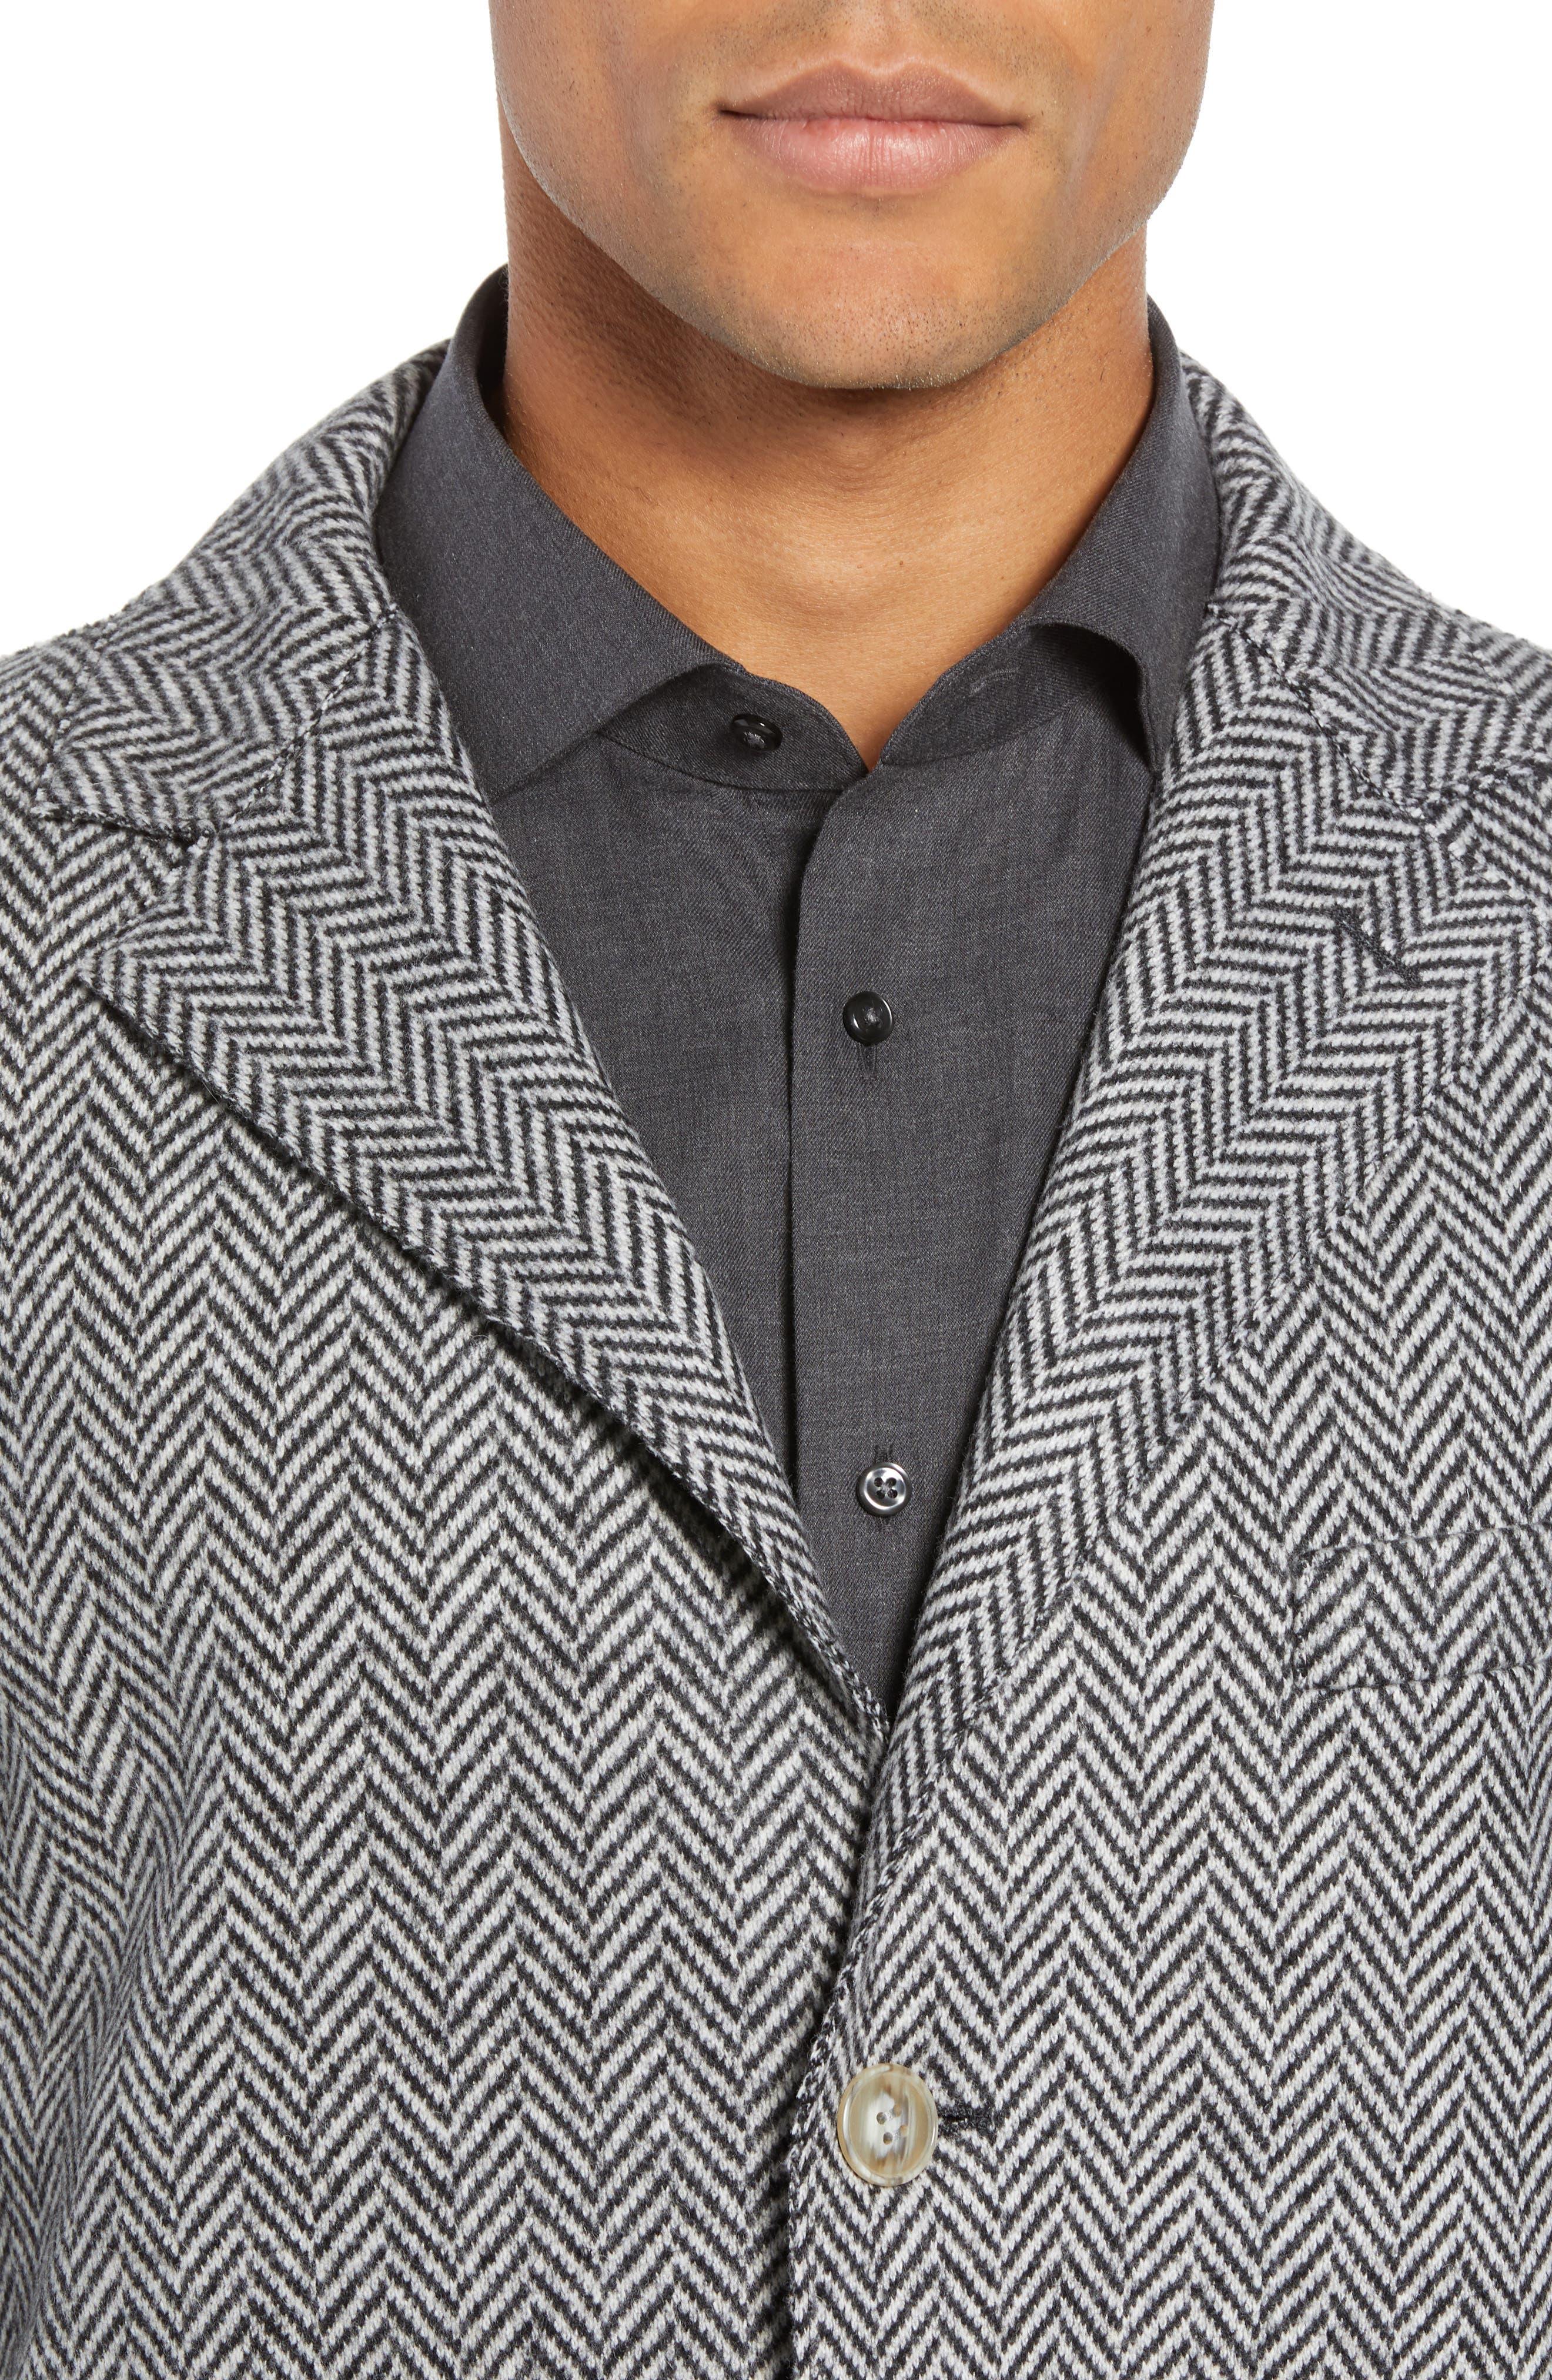 Trim Fit Wool Blend Top Coat,                             Alternate thumbnail 4, color,                             GREY